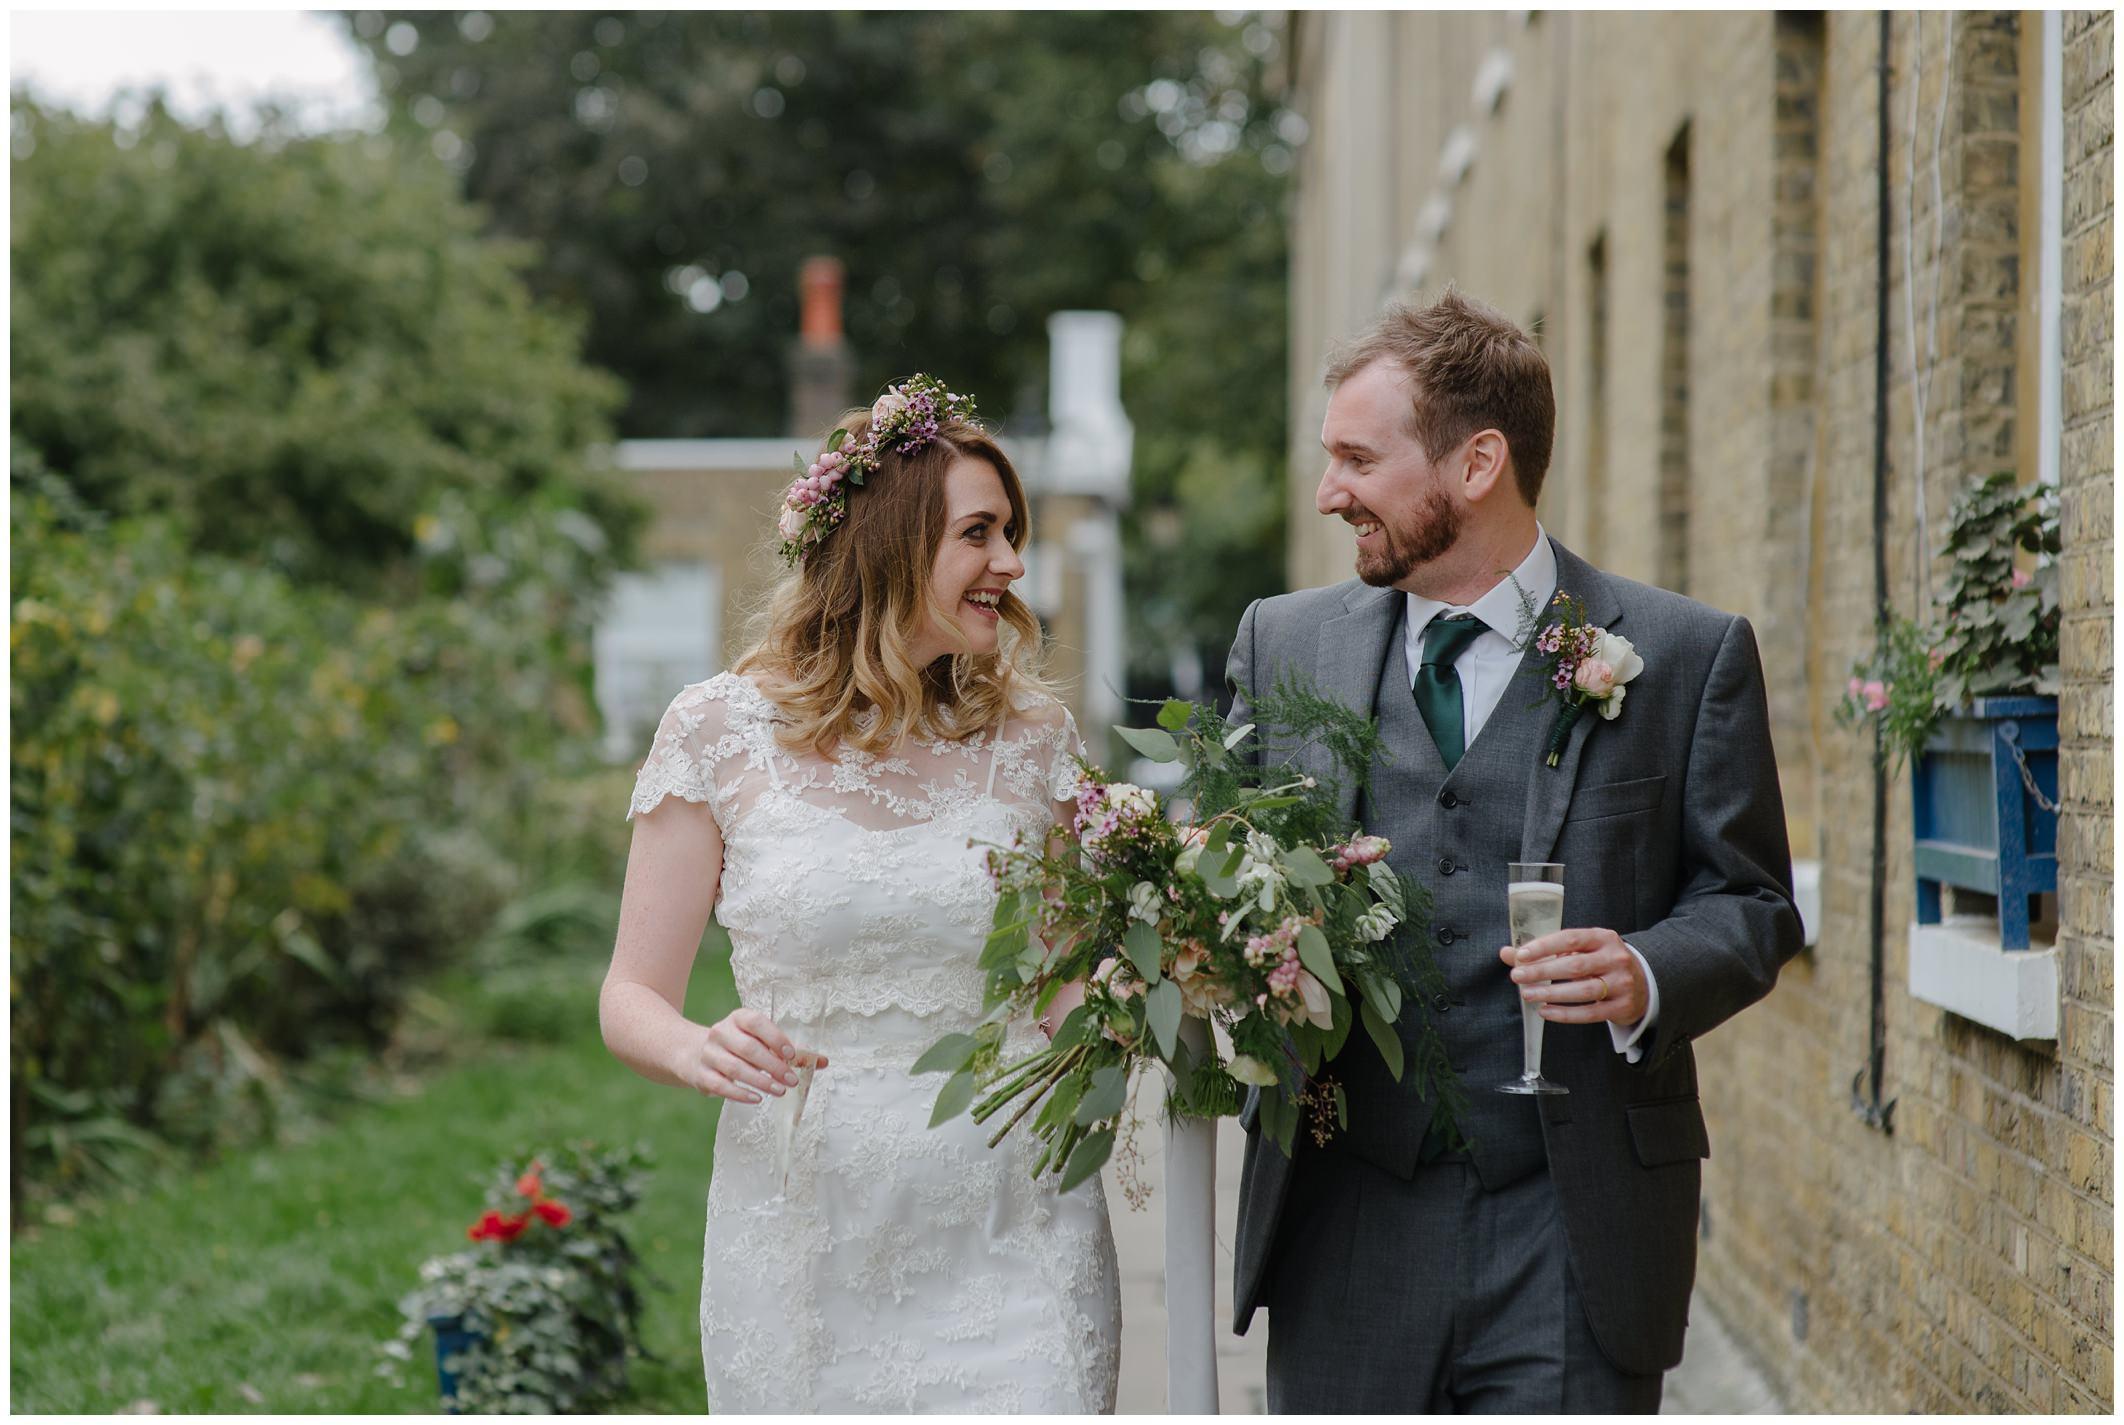 asylum_chapel_peckham_rosendale_wedding_jude_browne_photography_0111.jpg